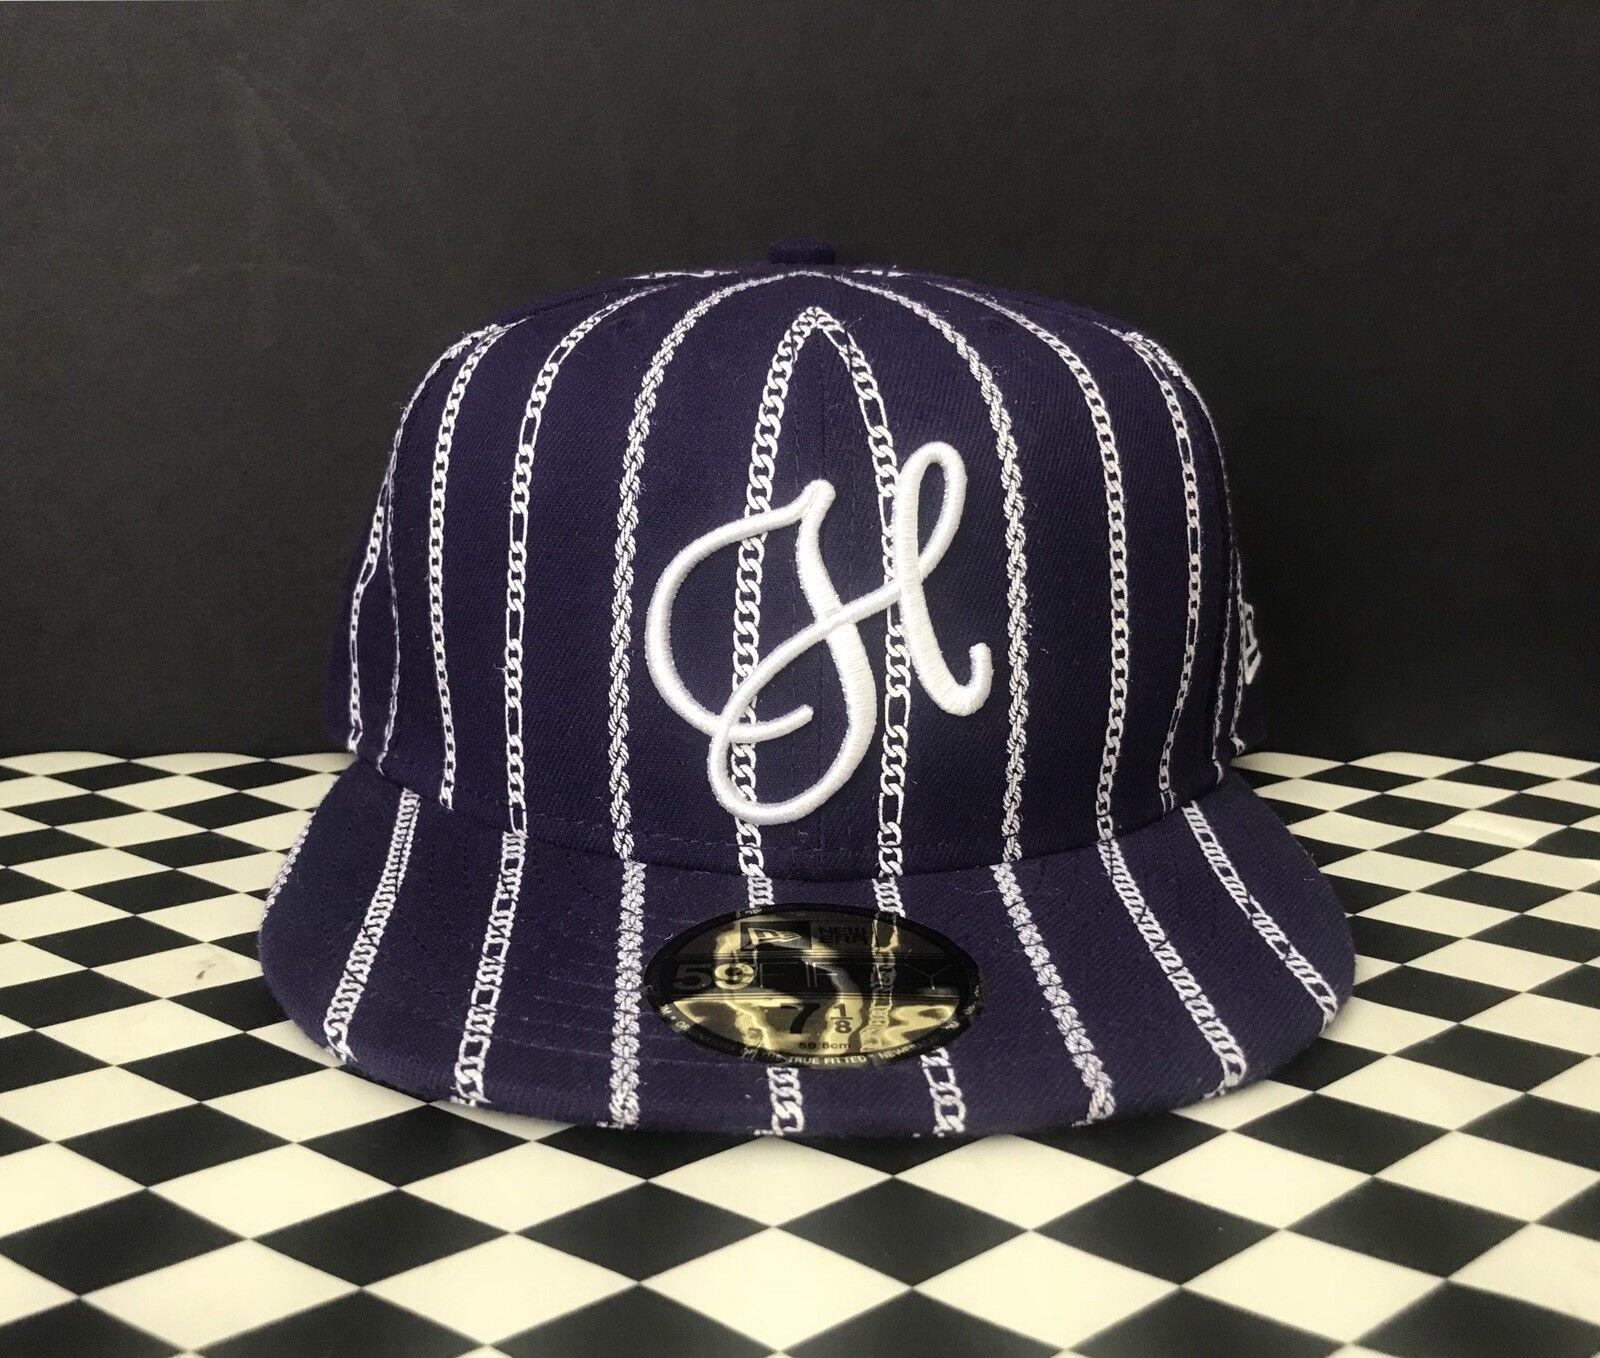 New Huf New Era 7 1 4 Fitted Hat supreme Purple Cuban Links Pinstripe  supreme Hat nike 8 9. 3956da c767f2ad00da1